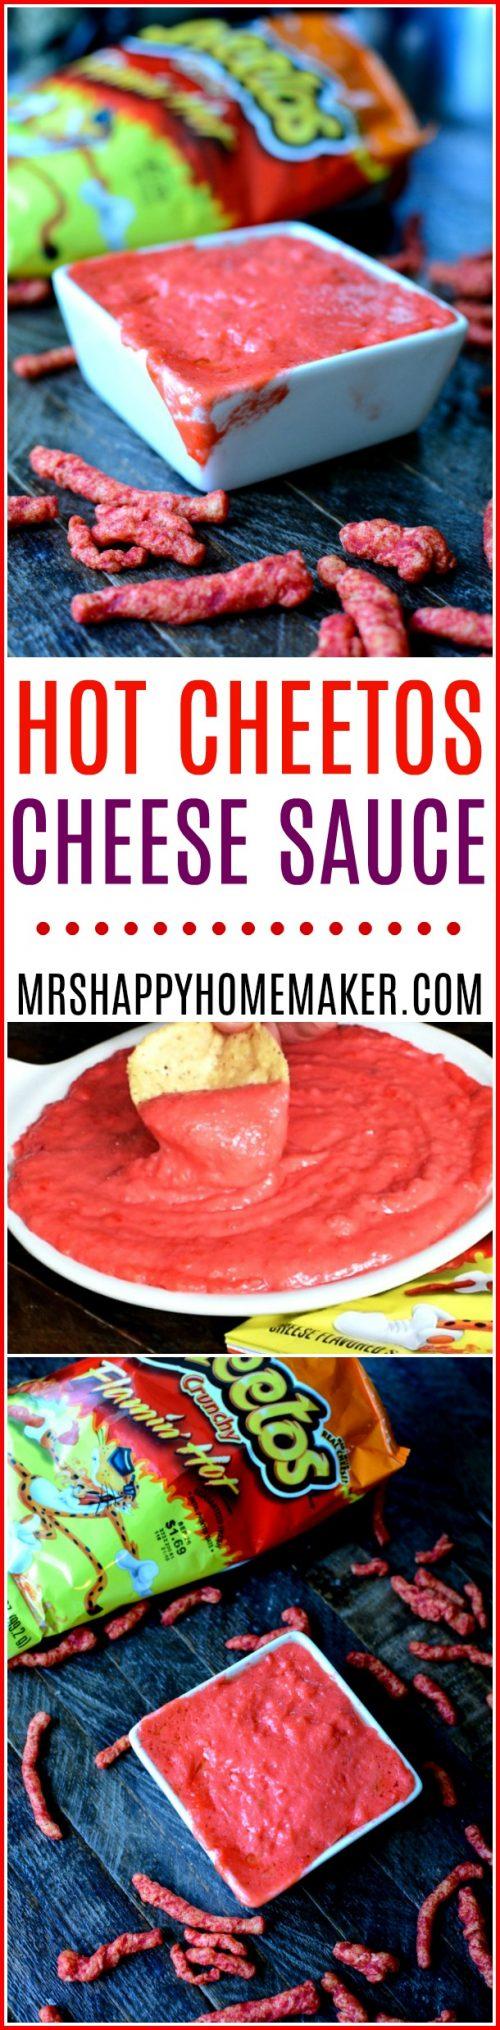 Hot Cheetos cheese sauce